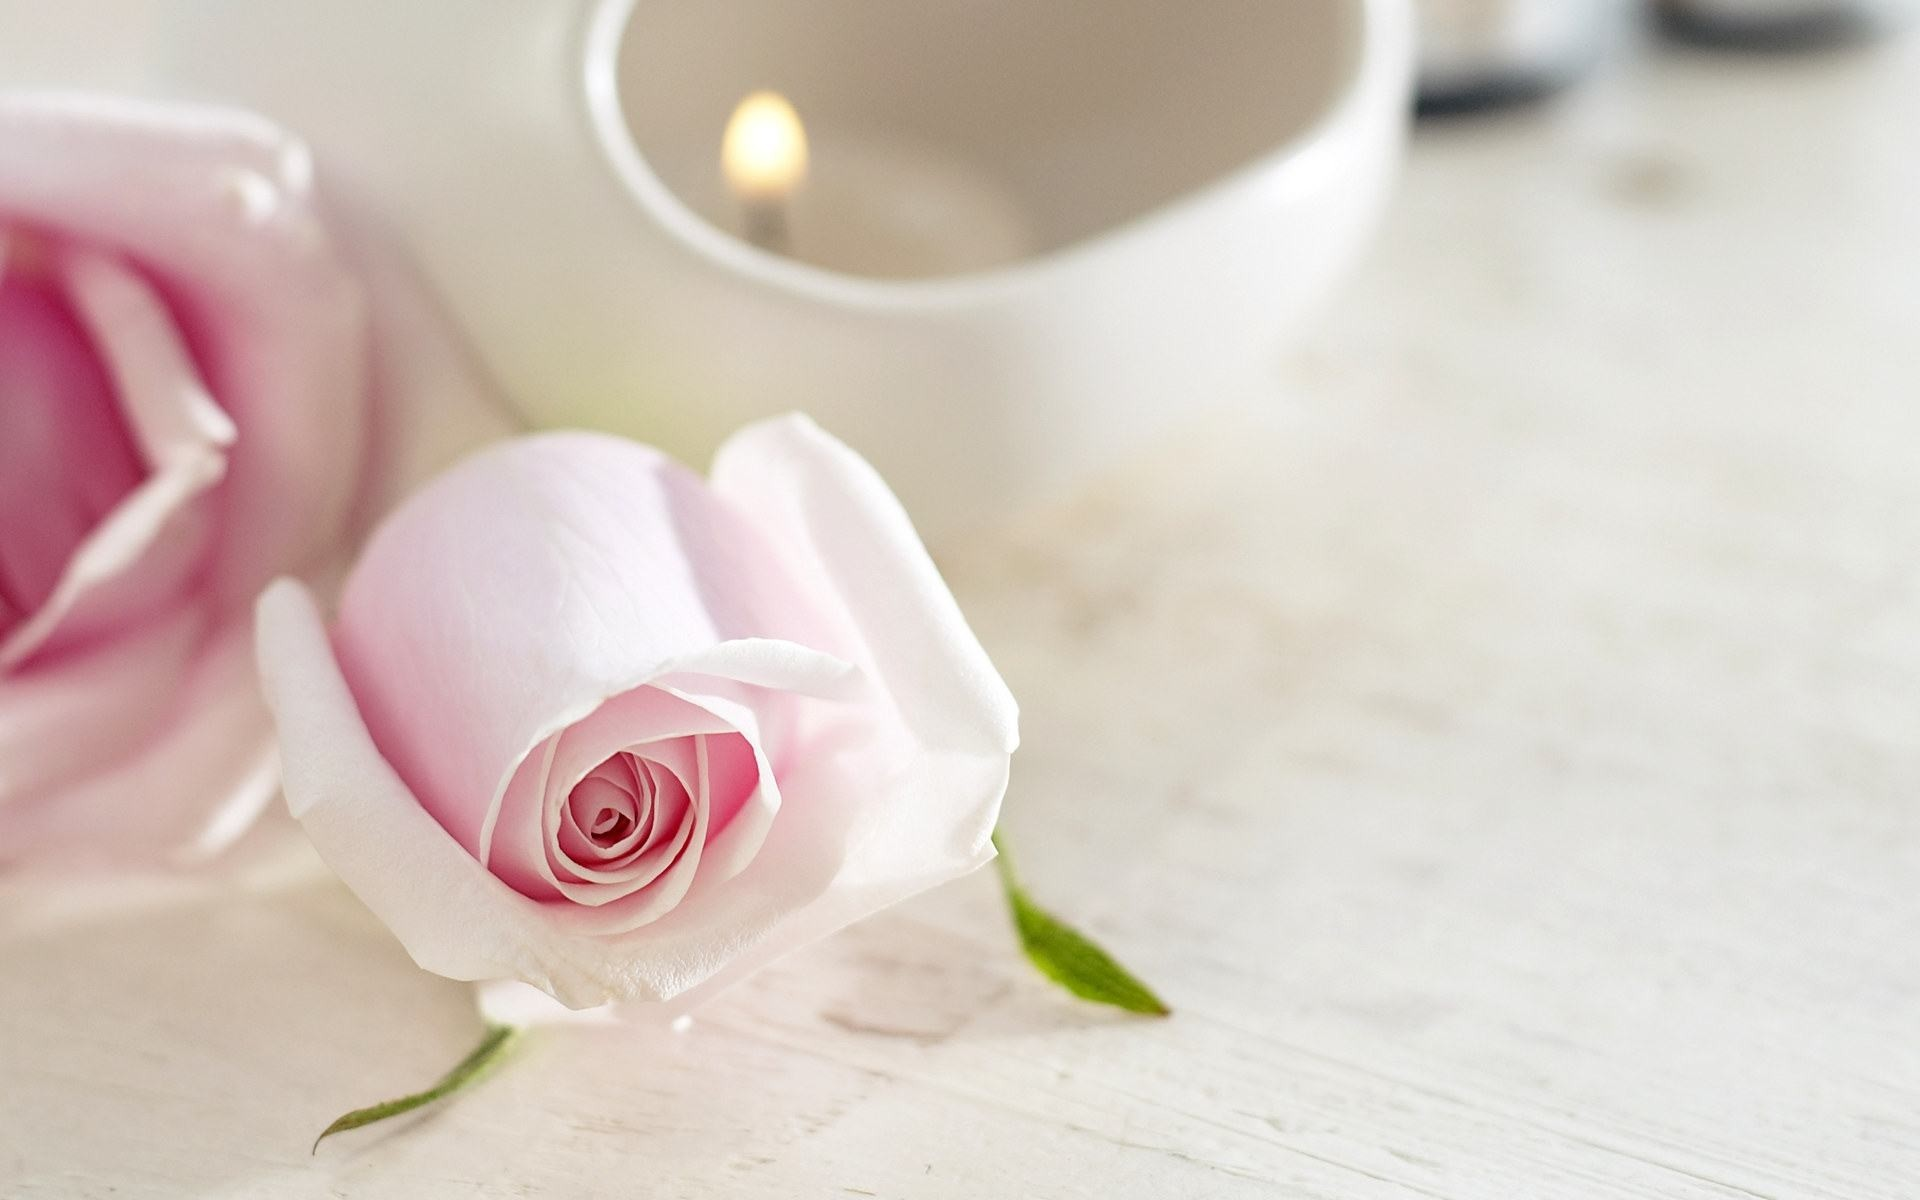 Wallpapers Backgrounds – wallpapers background white roses beautiful nature  light flower pink